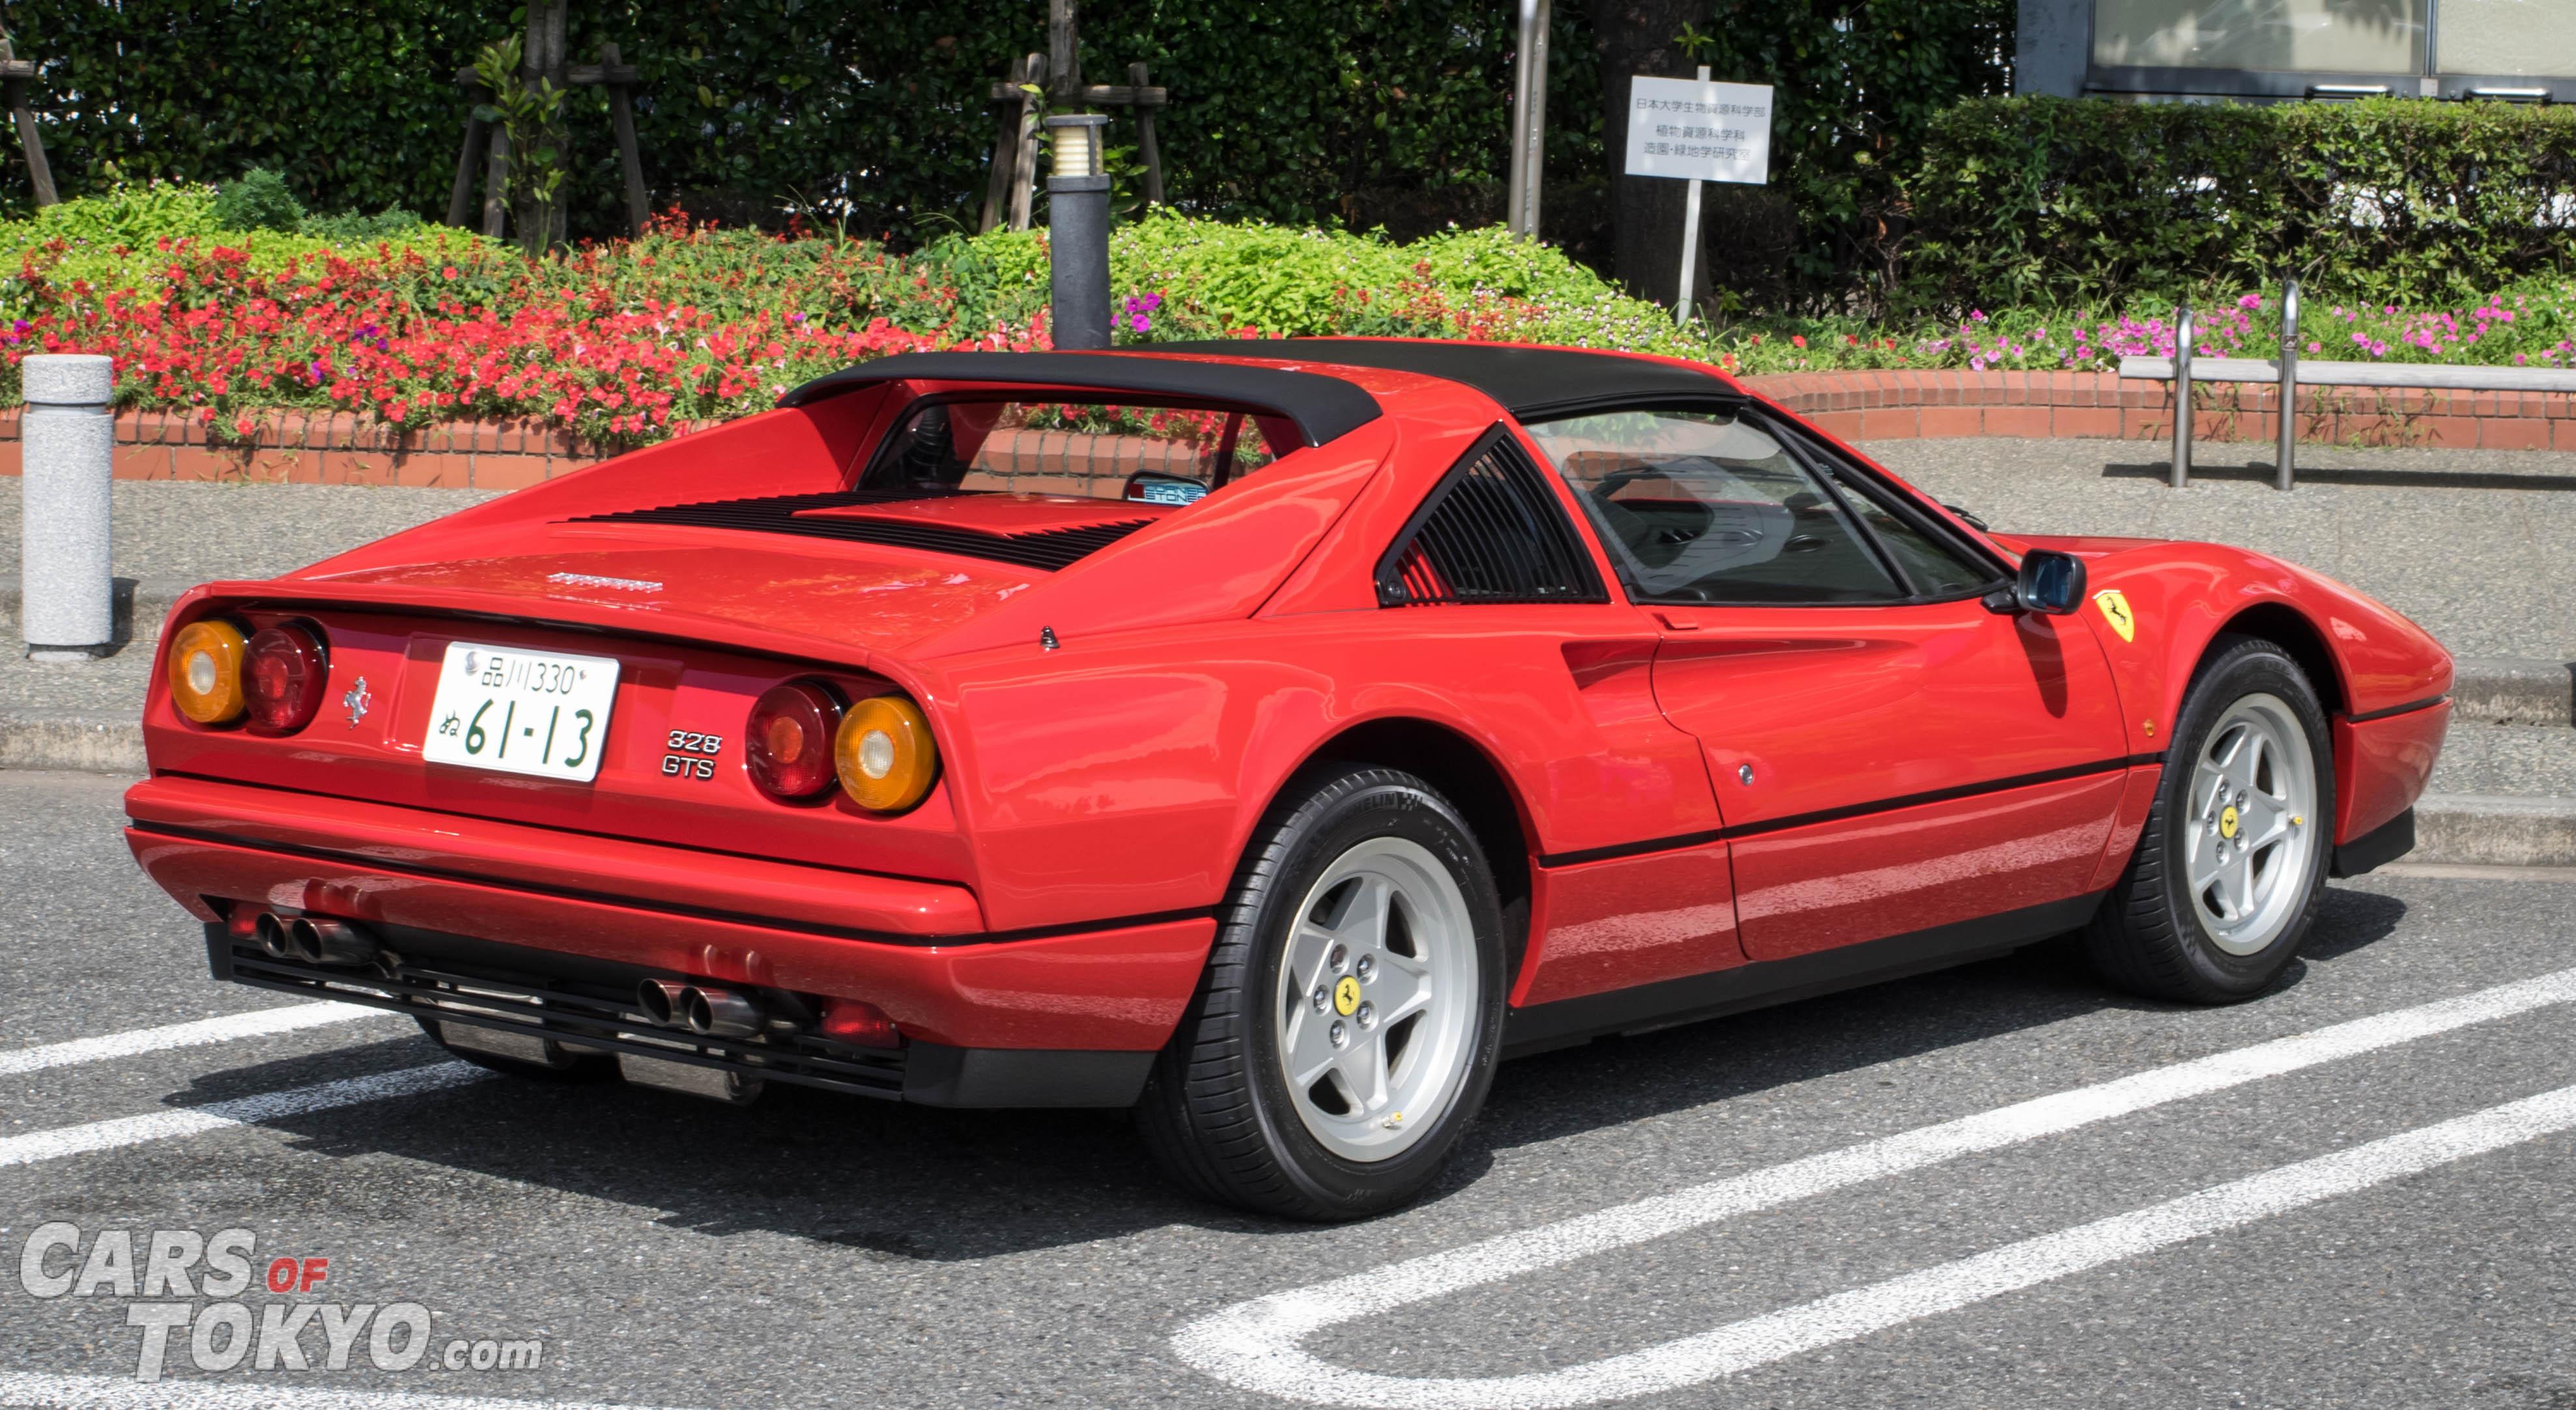 Cars of Tokyo Classic Ferrari 328 GTS